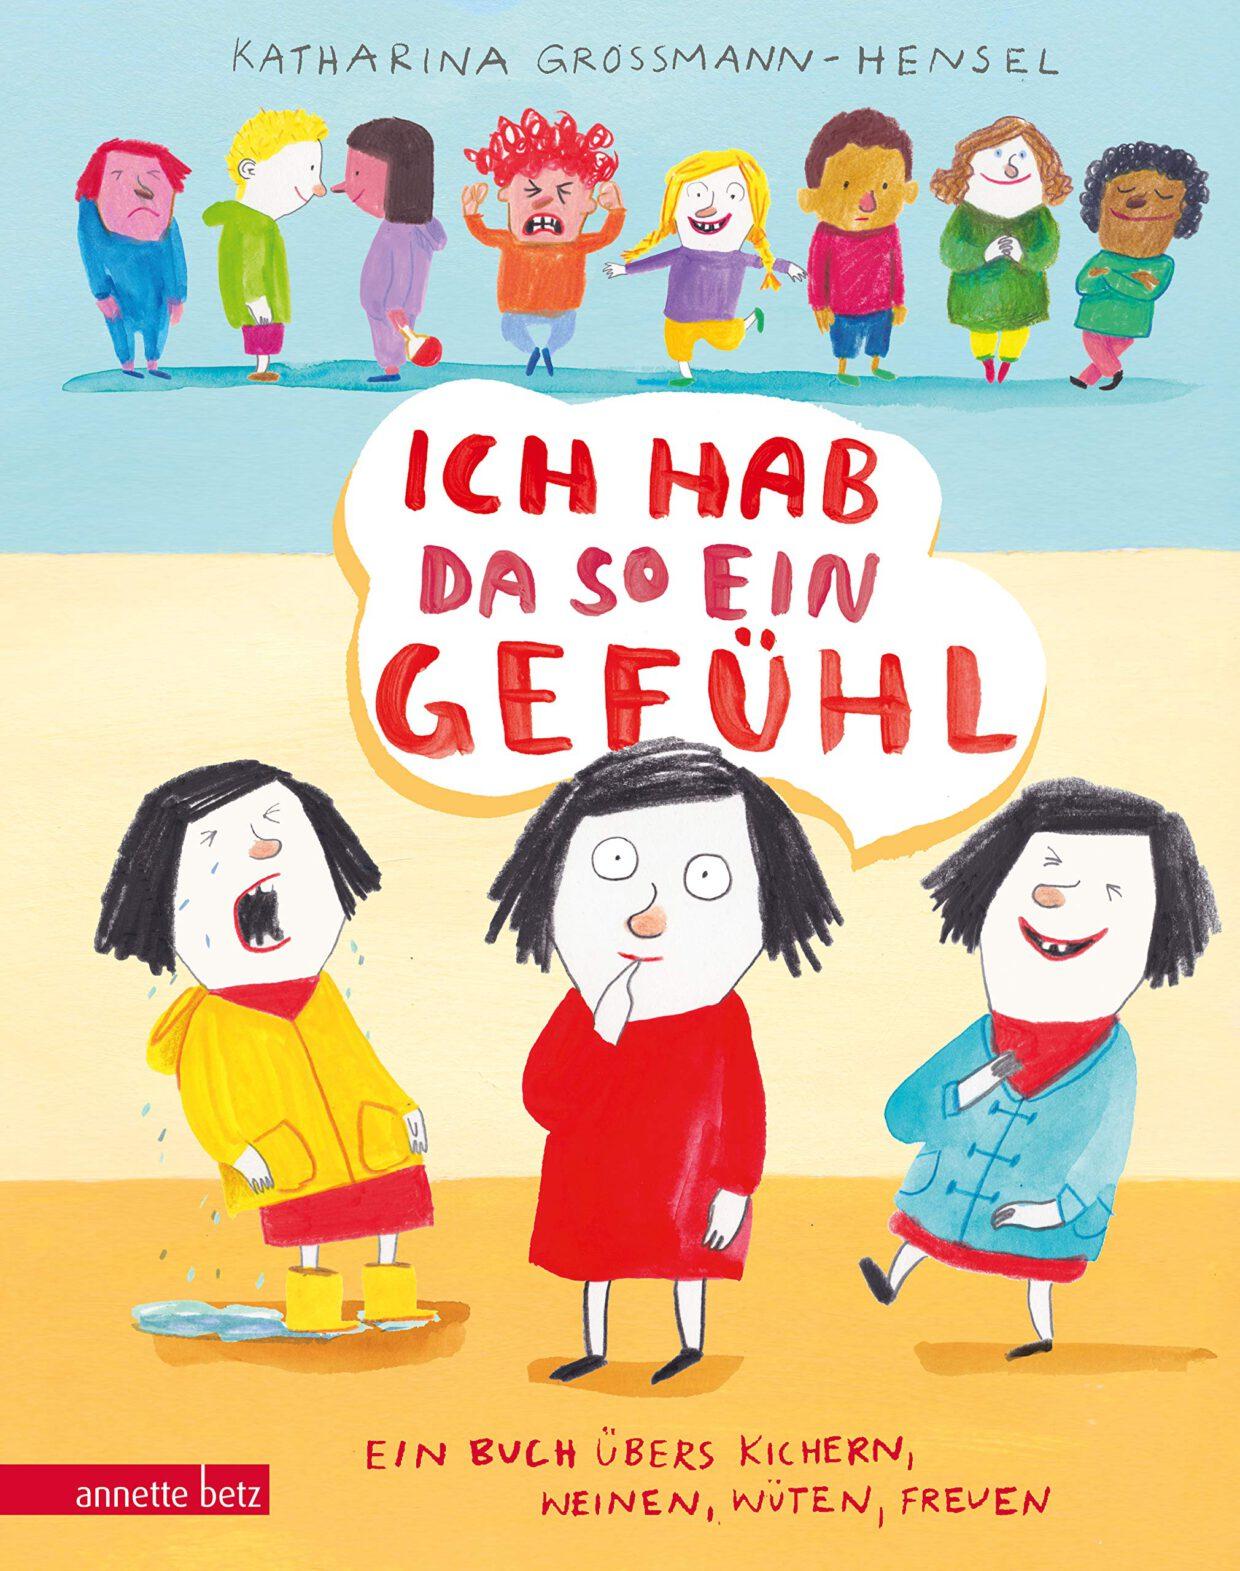 Katharina Grossmann-Hensel: Ich hab da so ein Gefühl